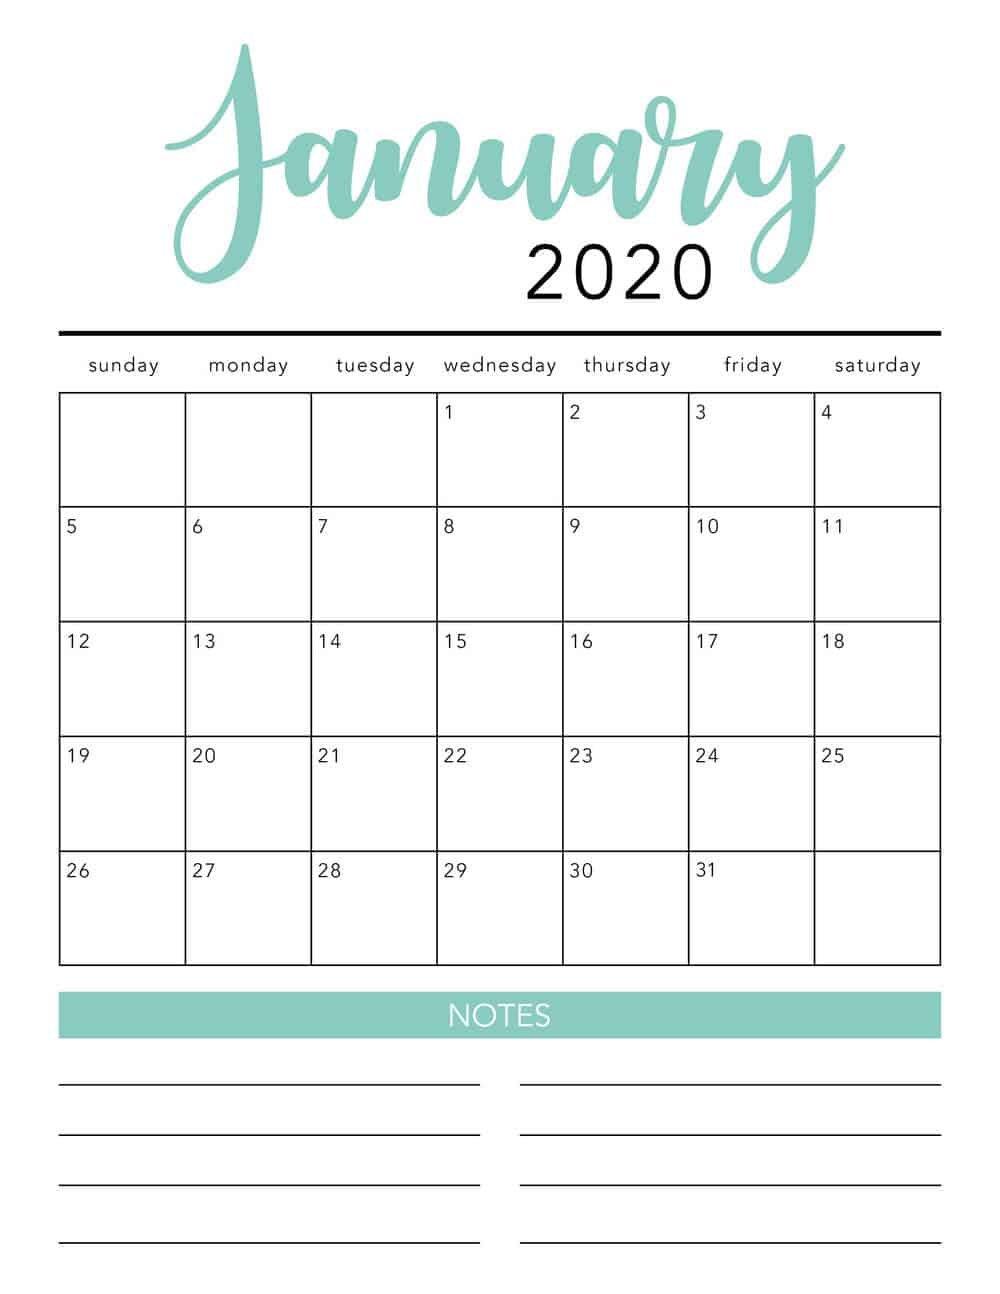 Free 2020 Printable Calendar Template (2 Colors!) – I 12 Month Editable Calendar